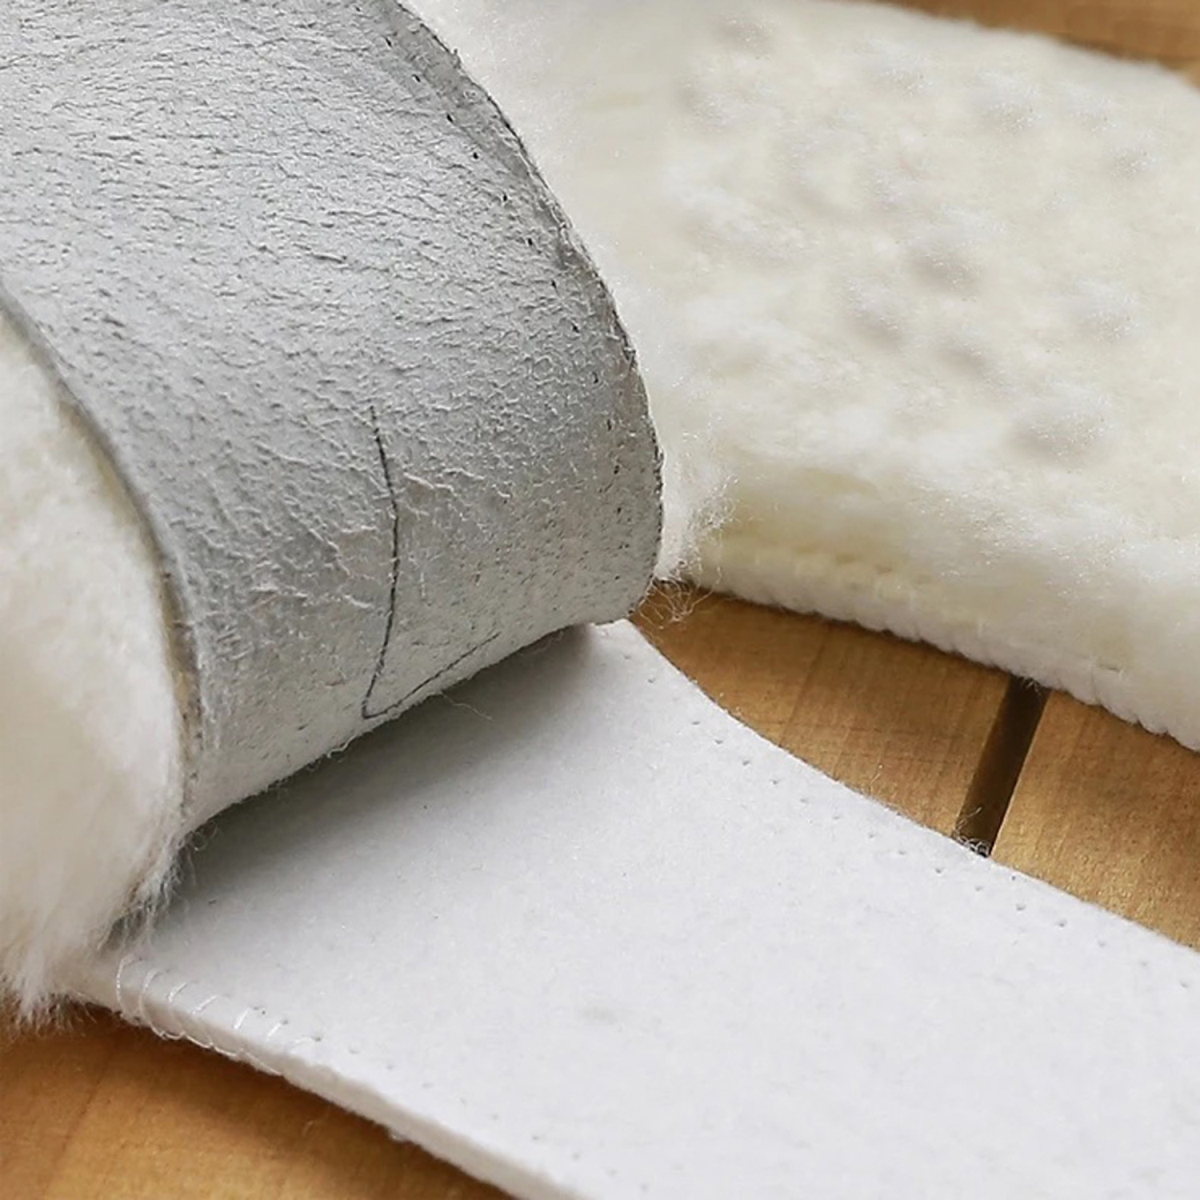 Plantillas de piel de oveja natural Cashmere Shearling térmico Botas - Accesorios de calzado - foto 6